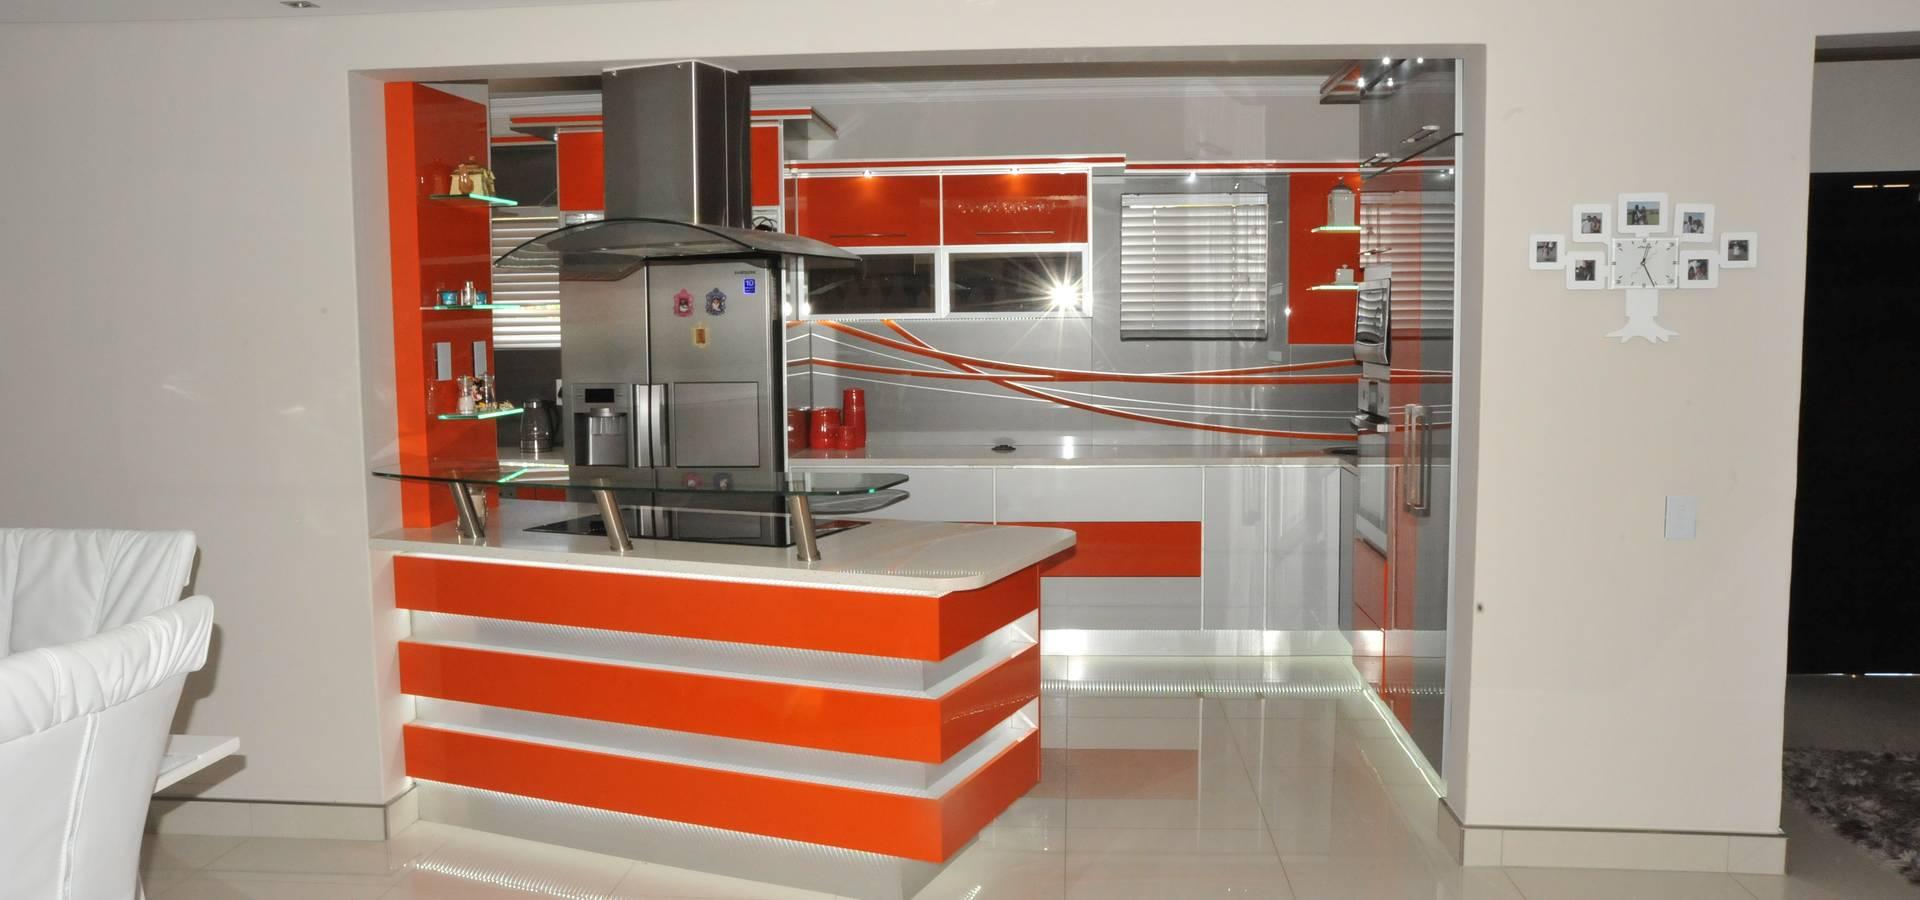 Expert Kitchens and Interiors